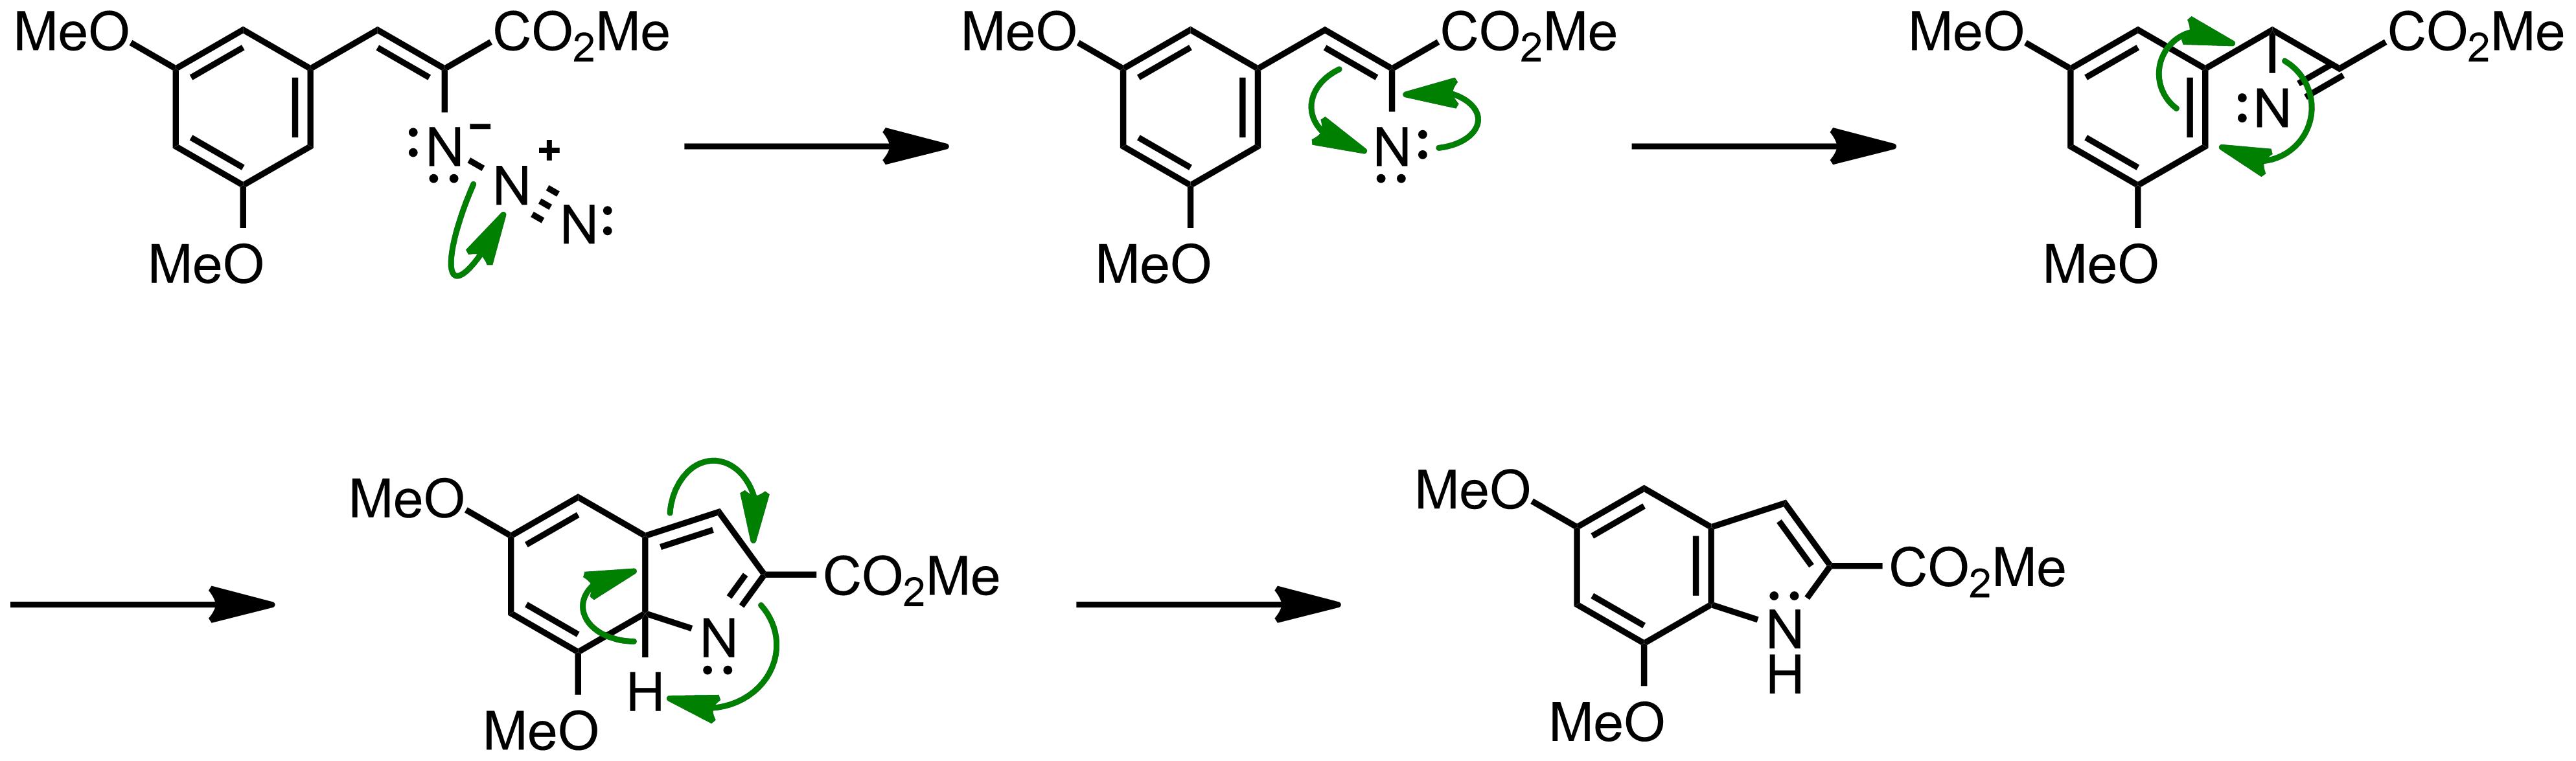 Mechanism of the Hemetsberger-Knittel Indole Synthesis